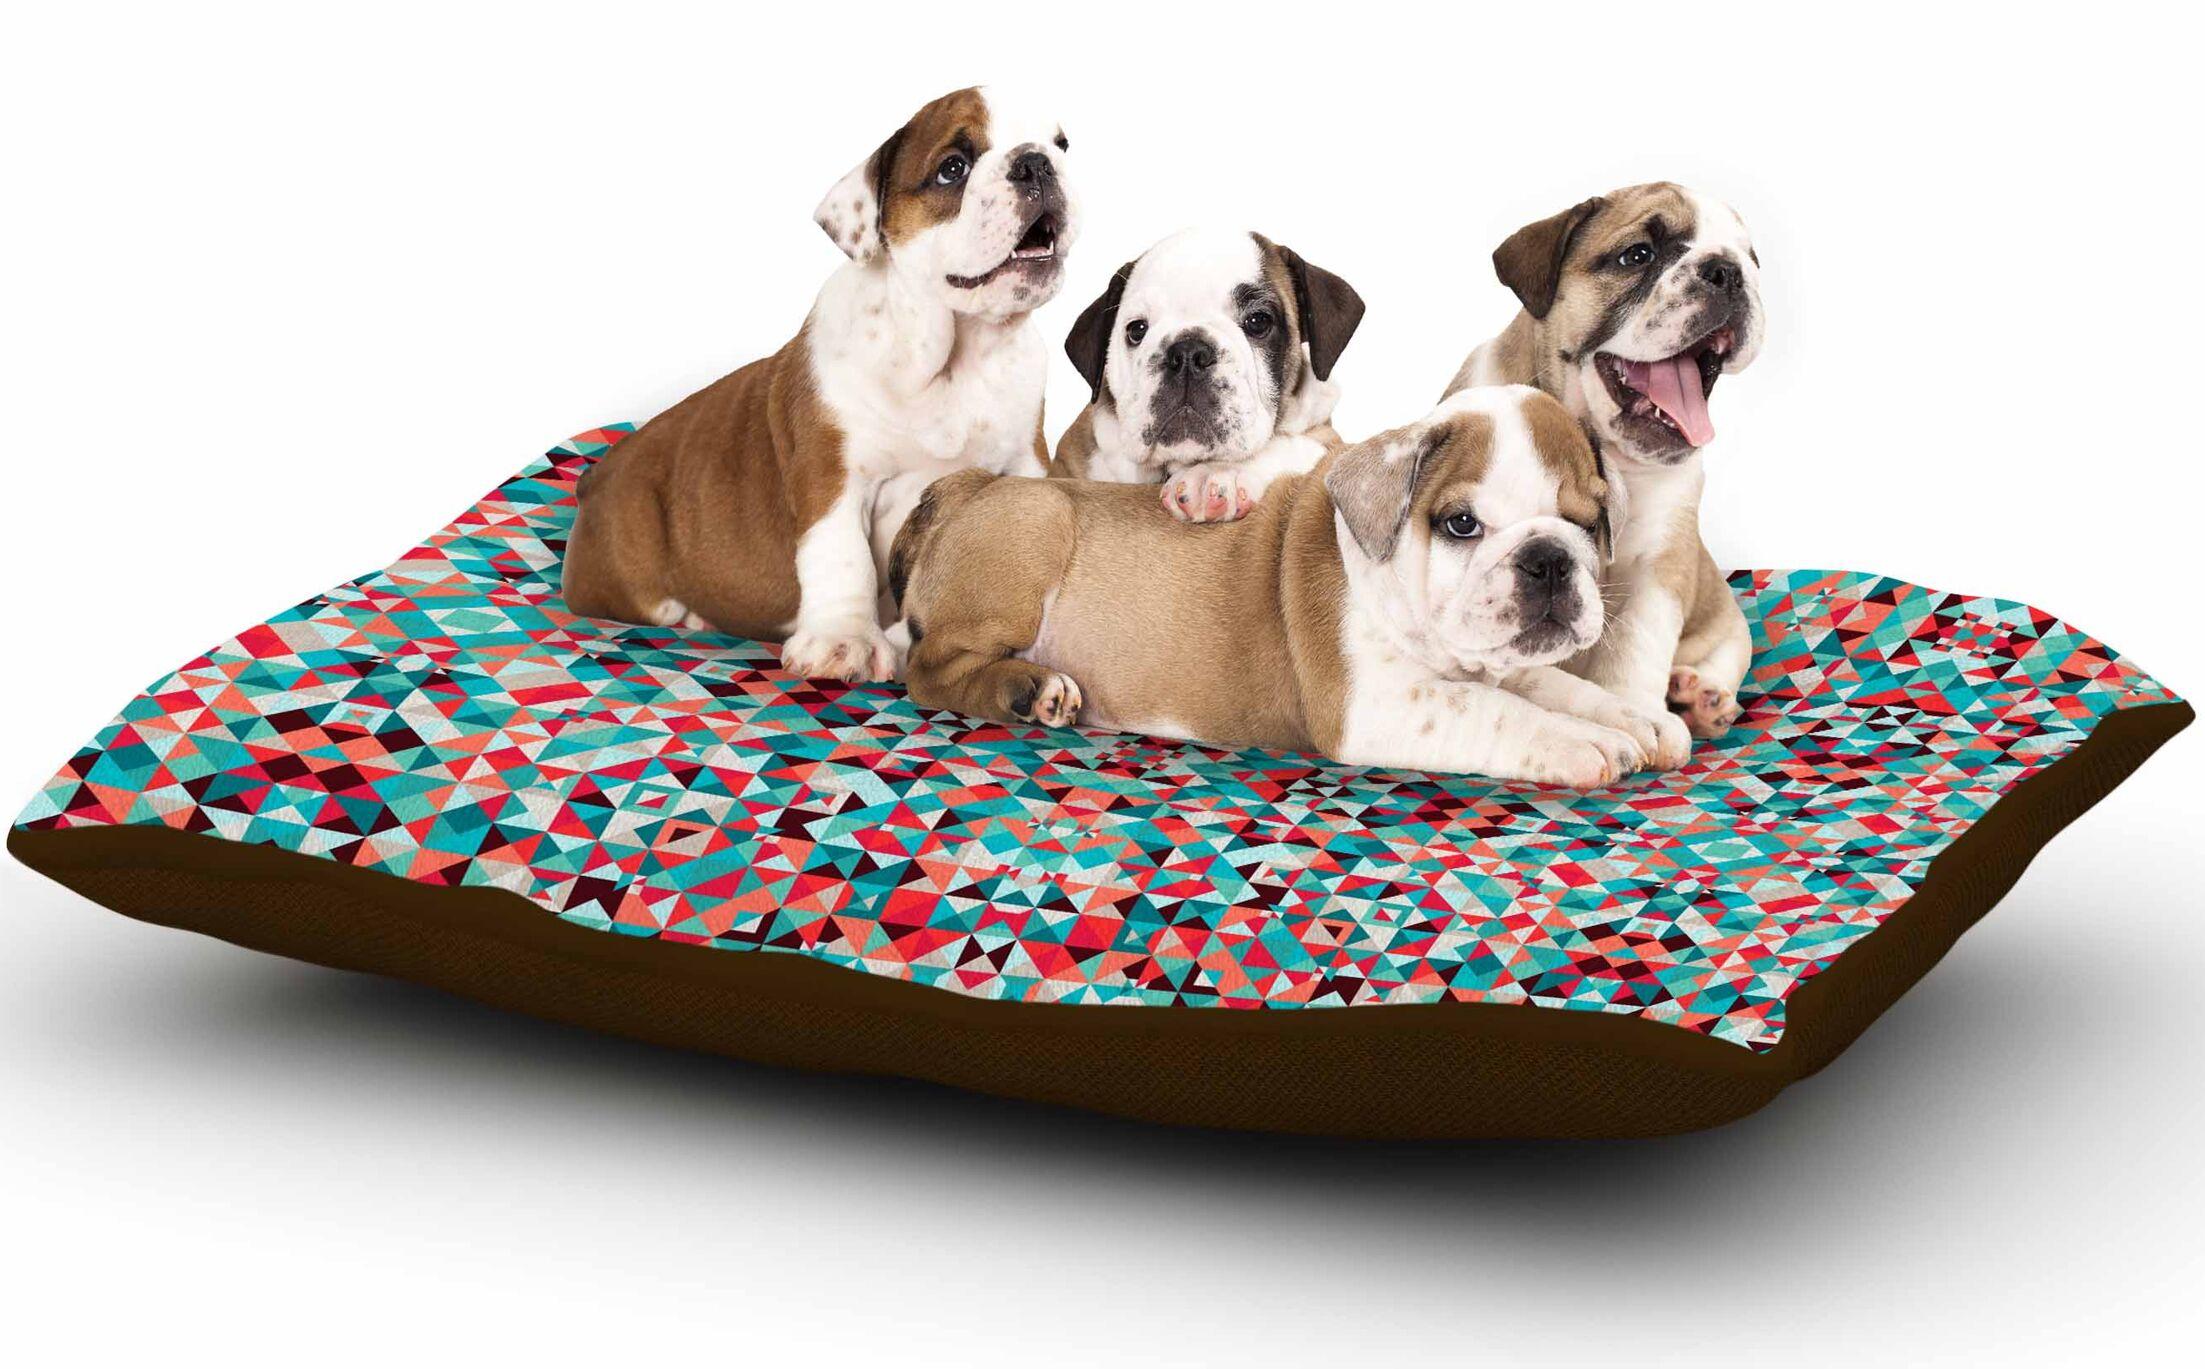 Allison Soupcoff 'Tart' Digital Dog Pillow with Fleece Cozy Top Size: Small (40